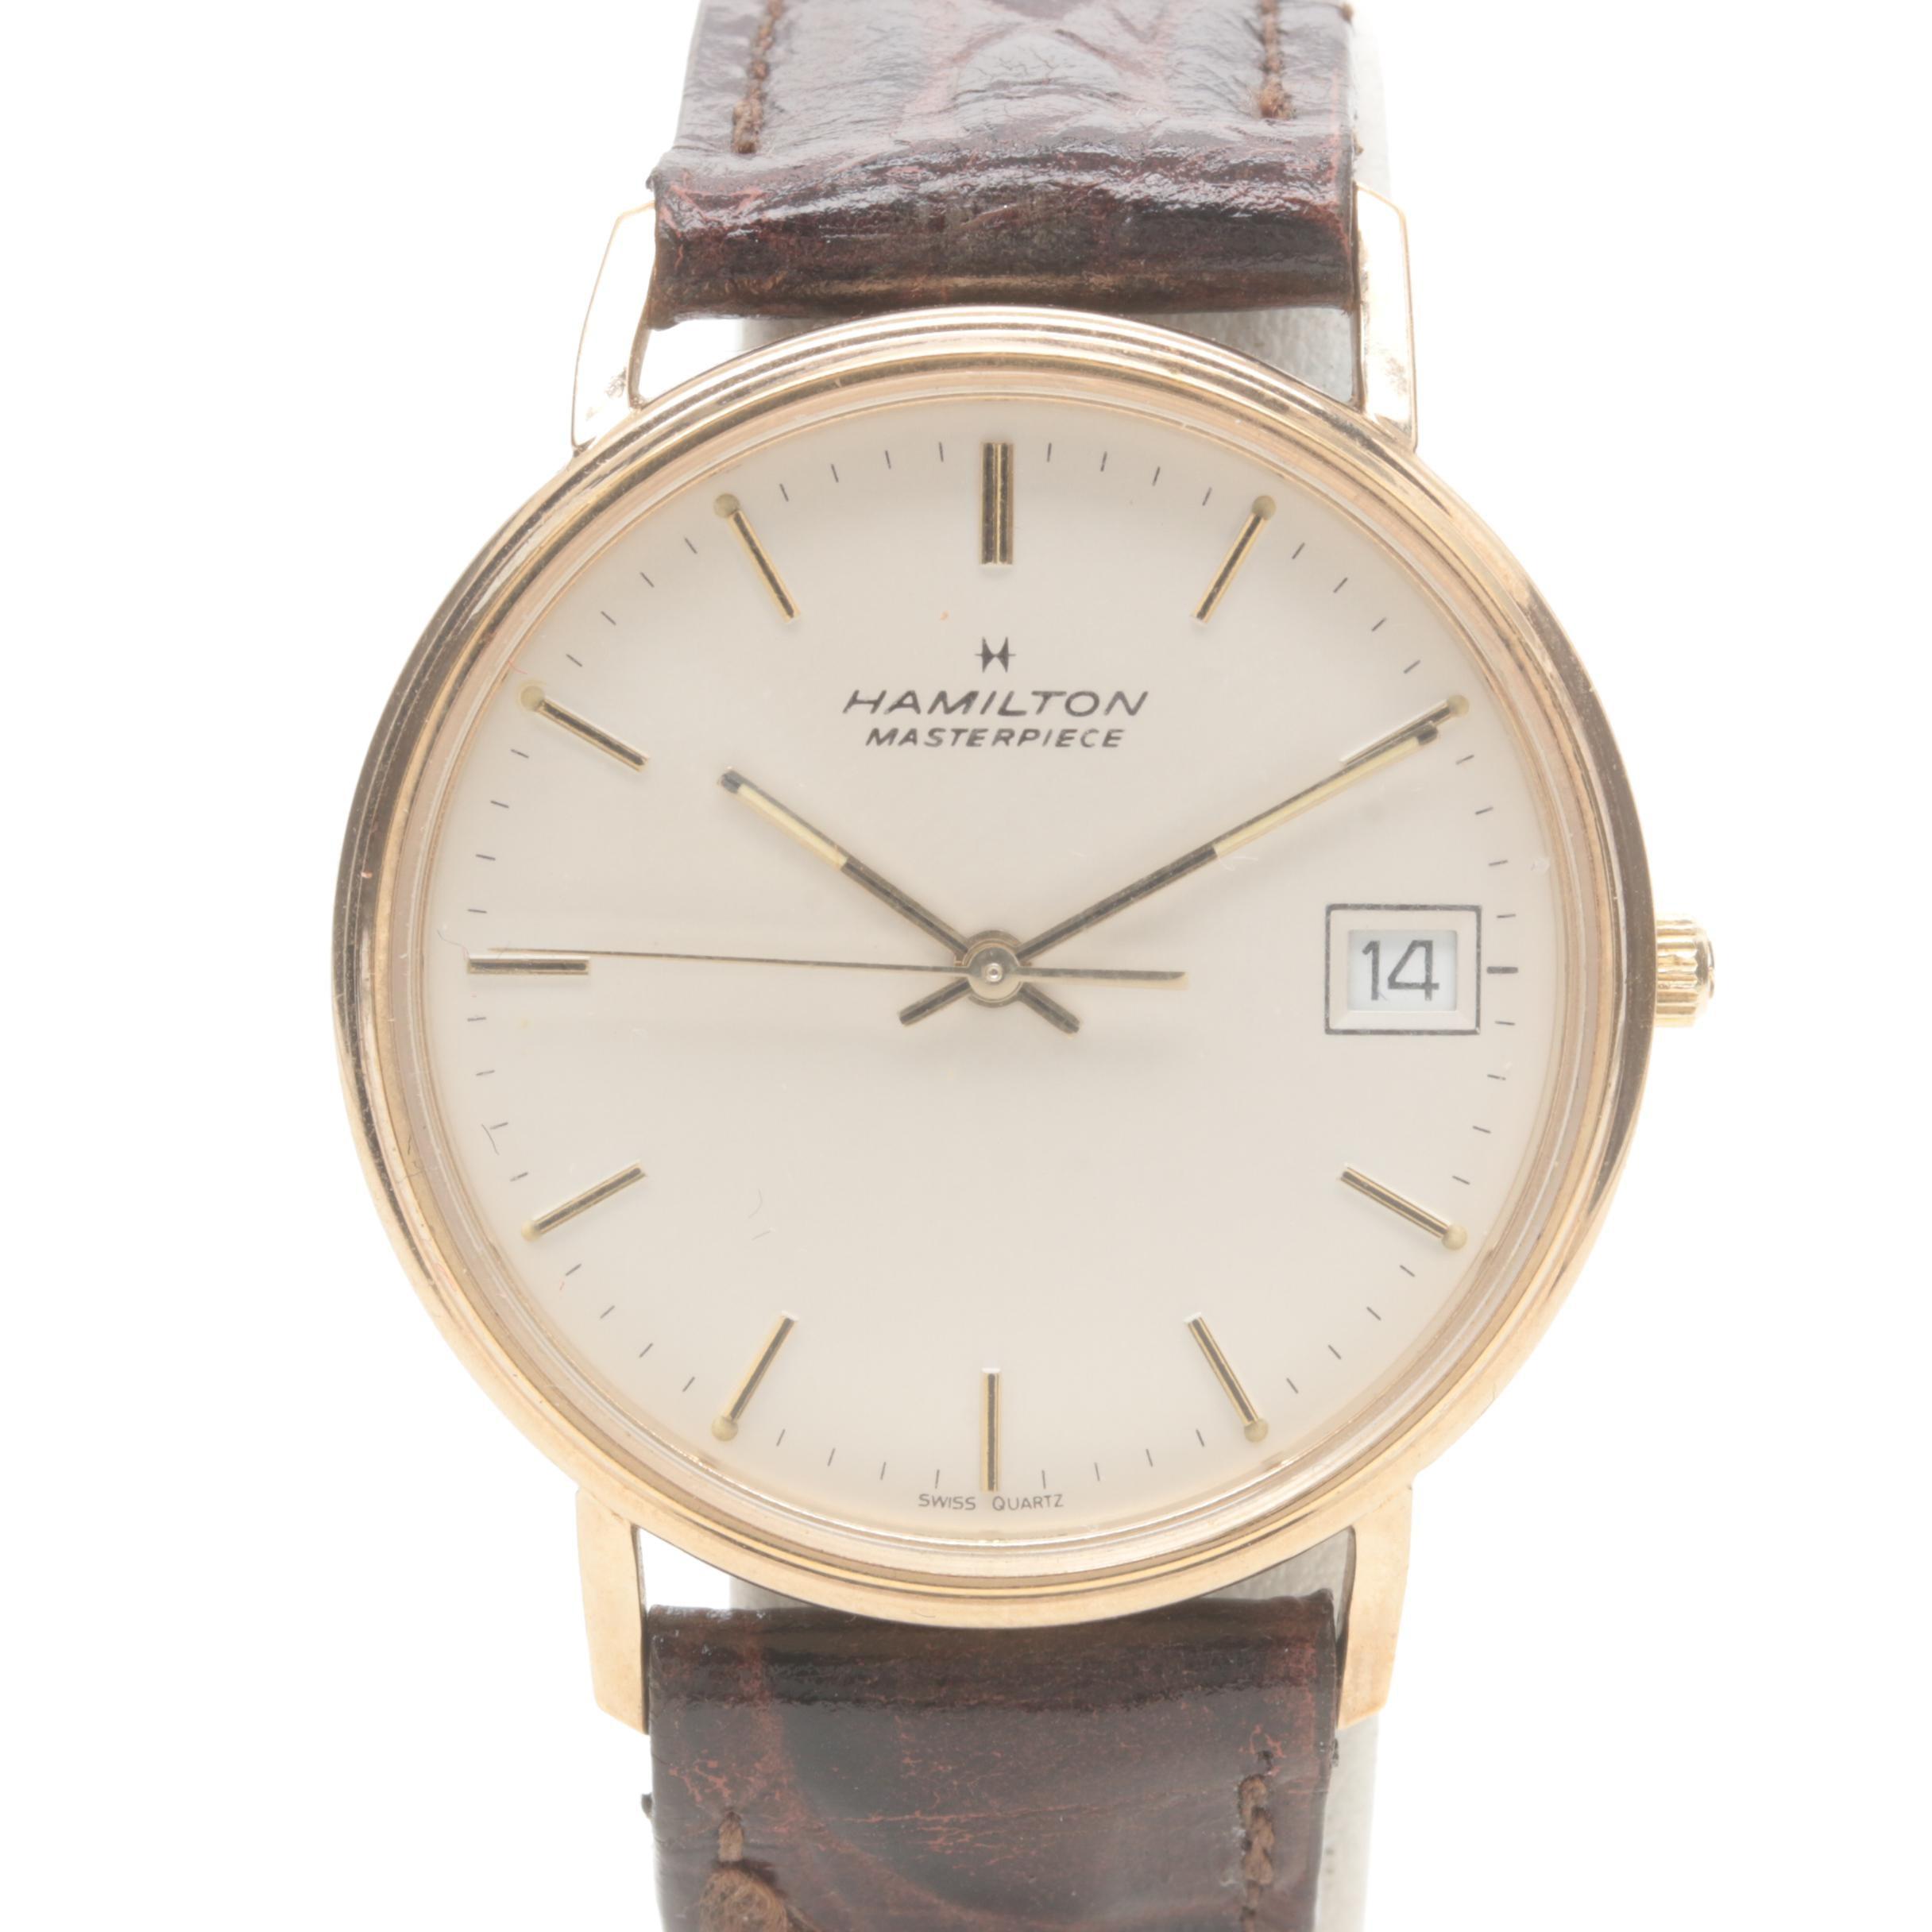 "Hamilton ""Masterpiece"" Gold Filled Wristwatch"